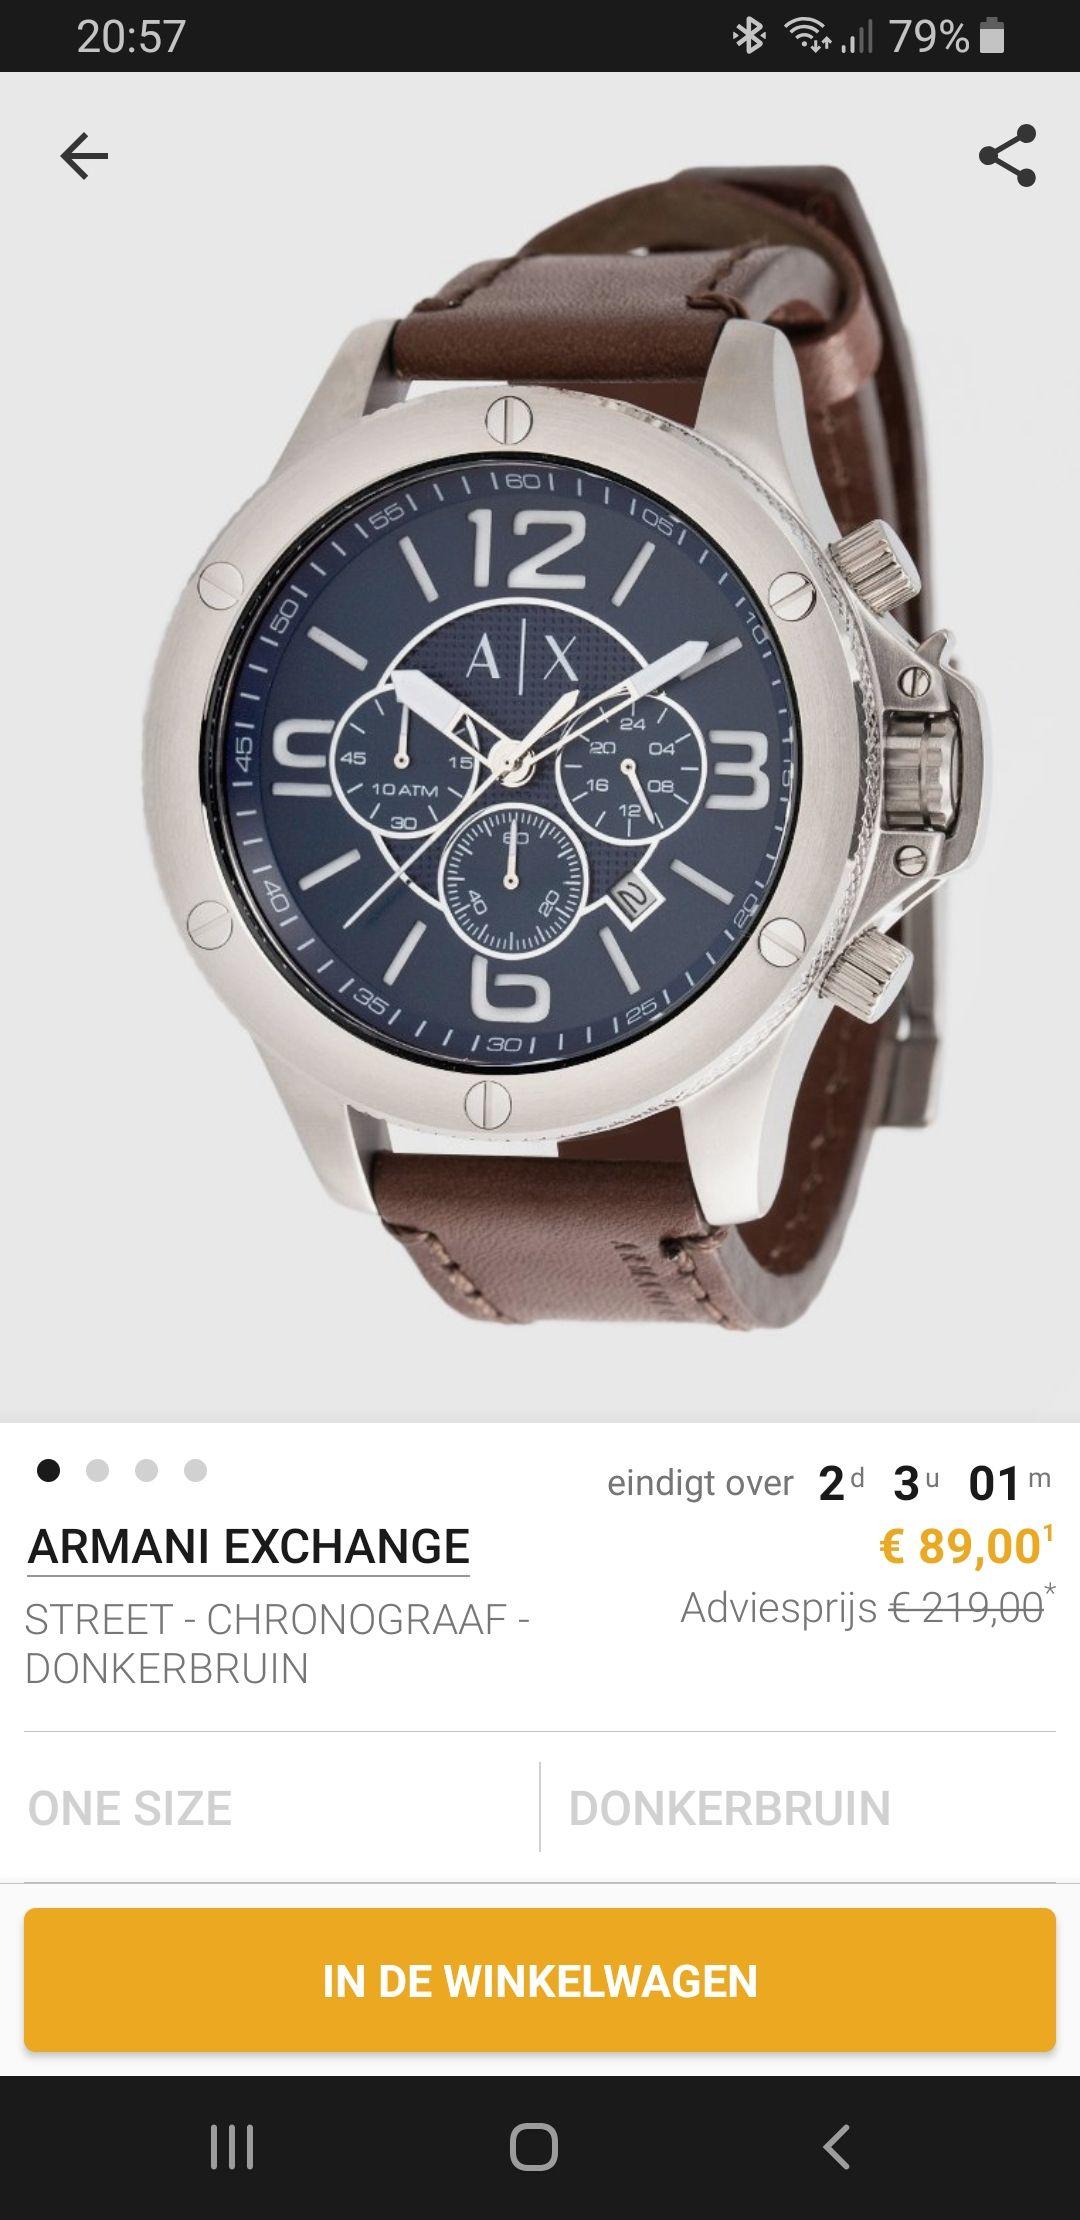 Verschillende Armani horloges @zalando lounge